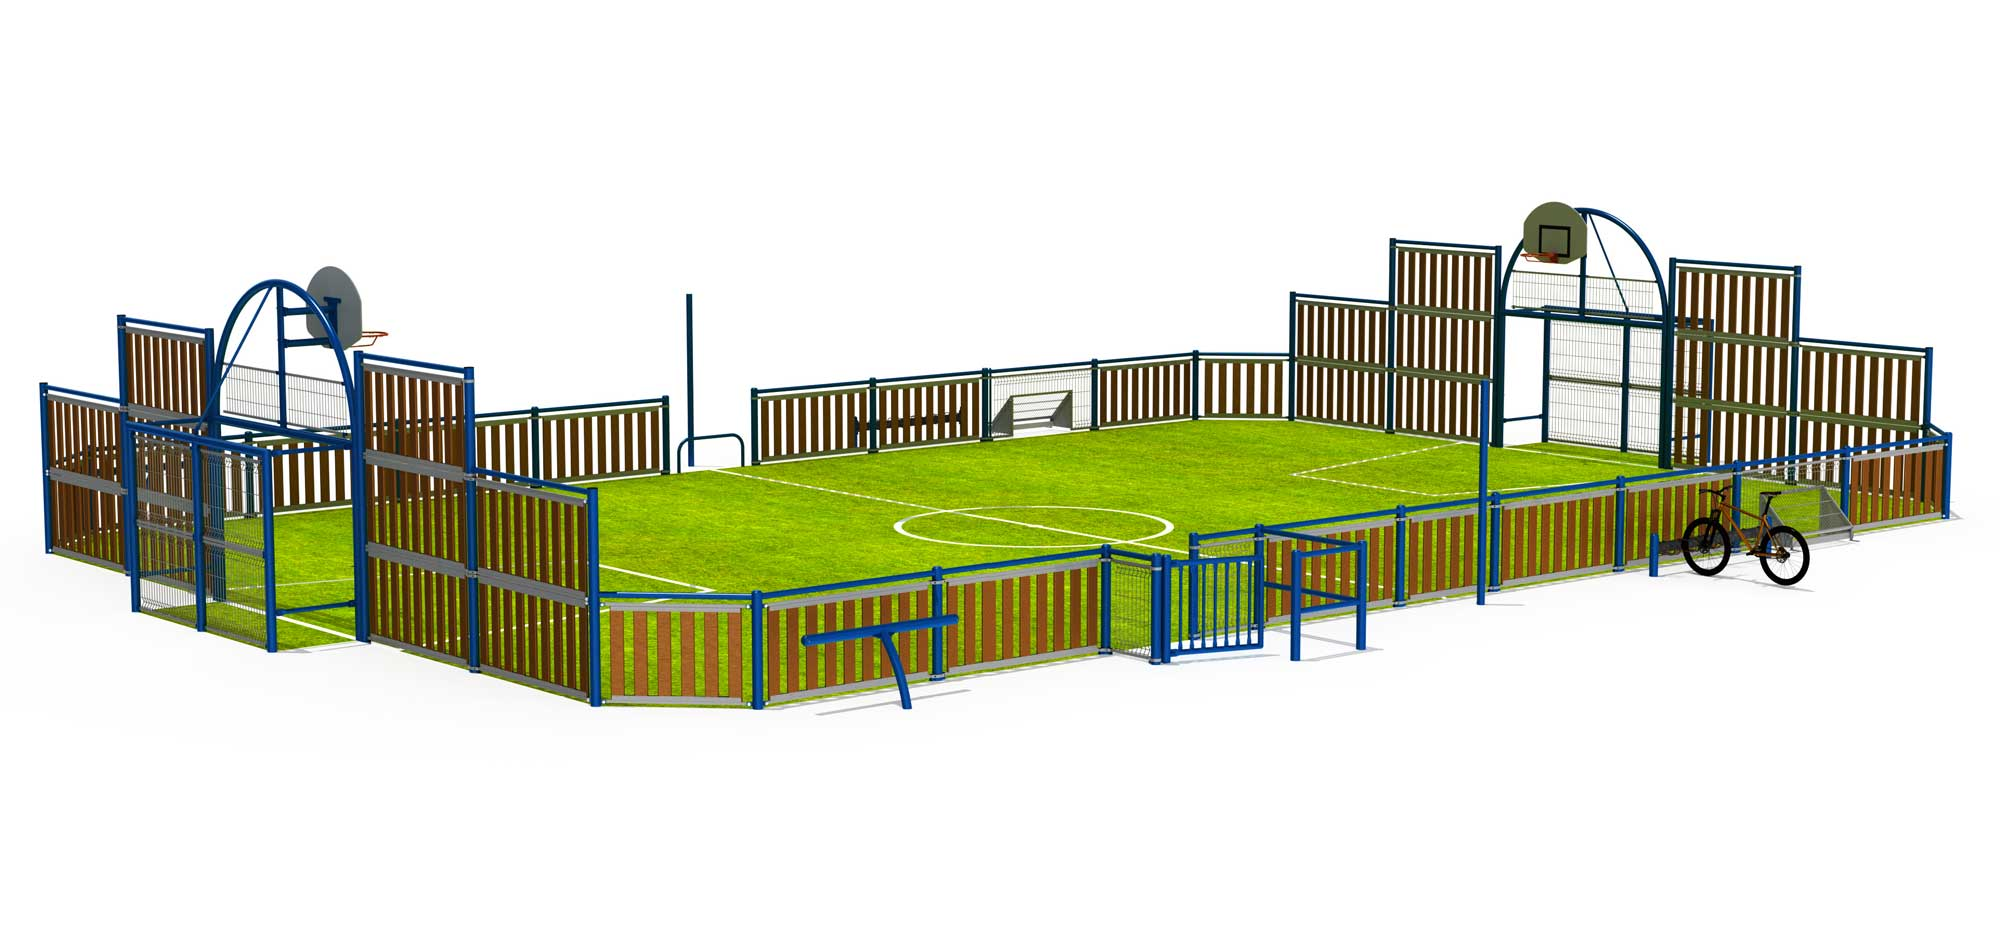 terrains multisports. Black Bedroom Furniture Sets. Home Design Ideas